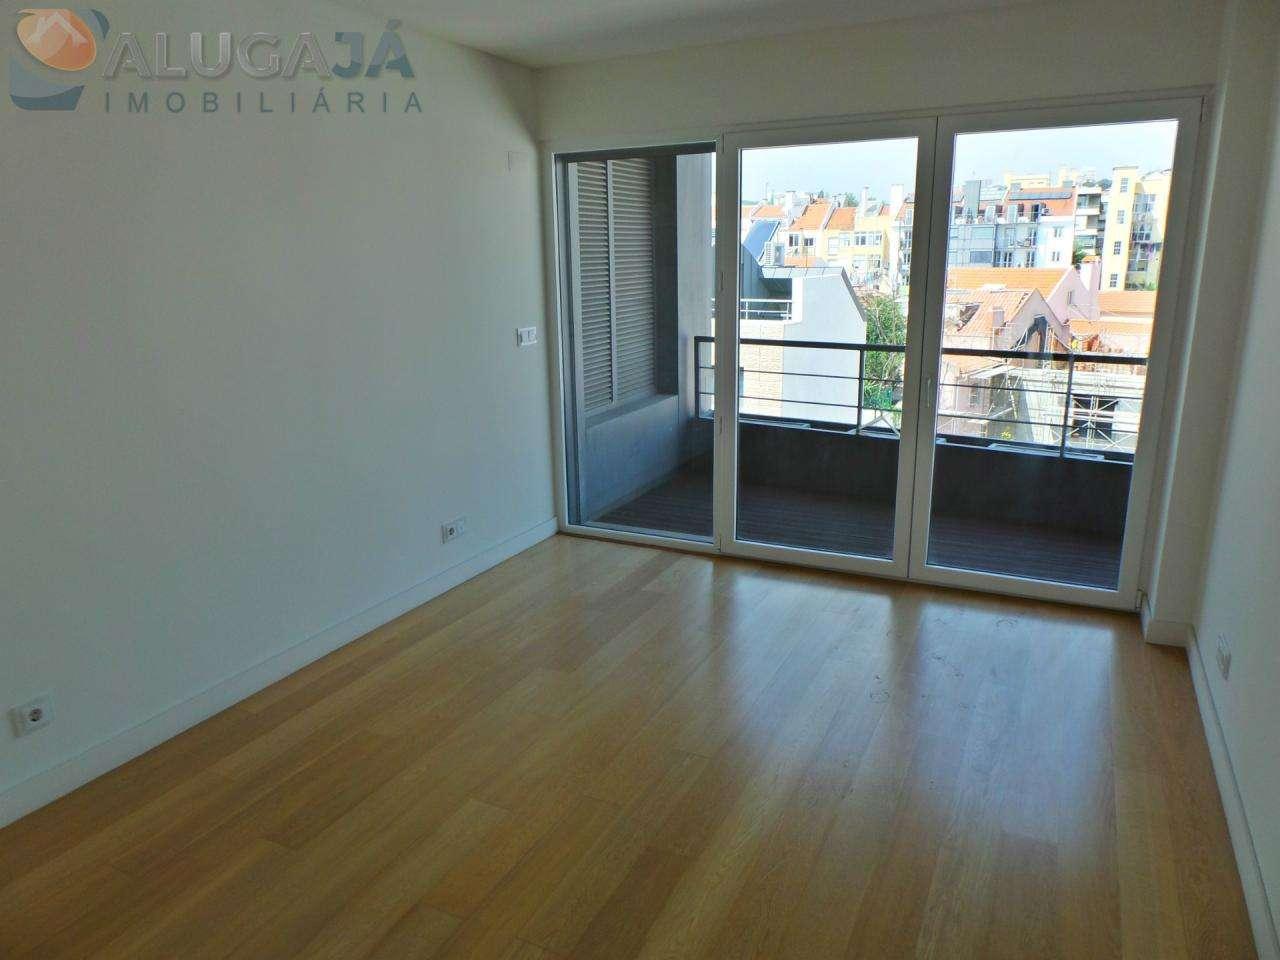 Apartamento para comprar, Belém, Lisboa - Foto 17